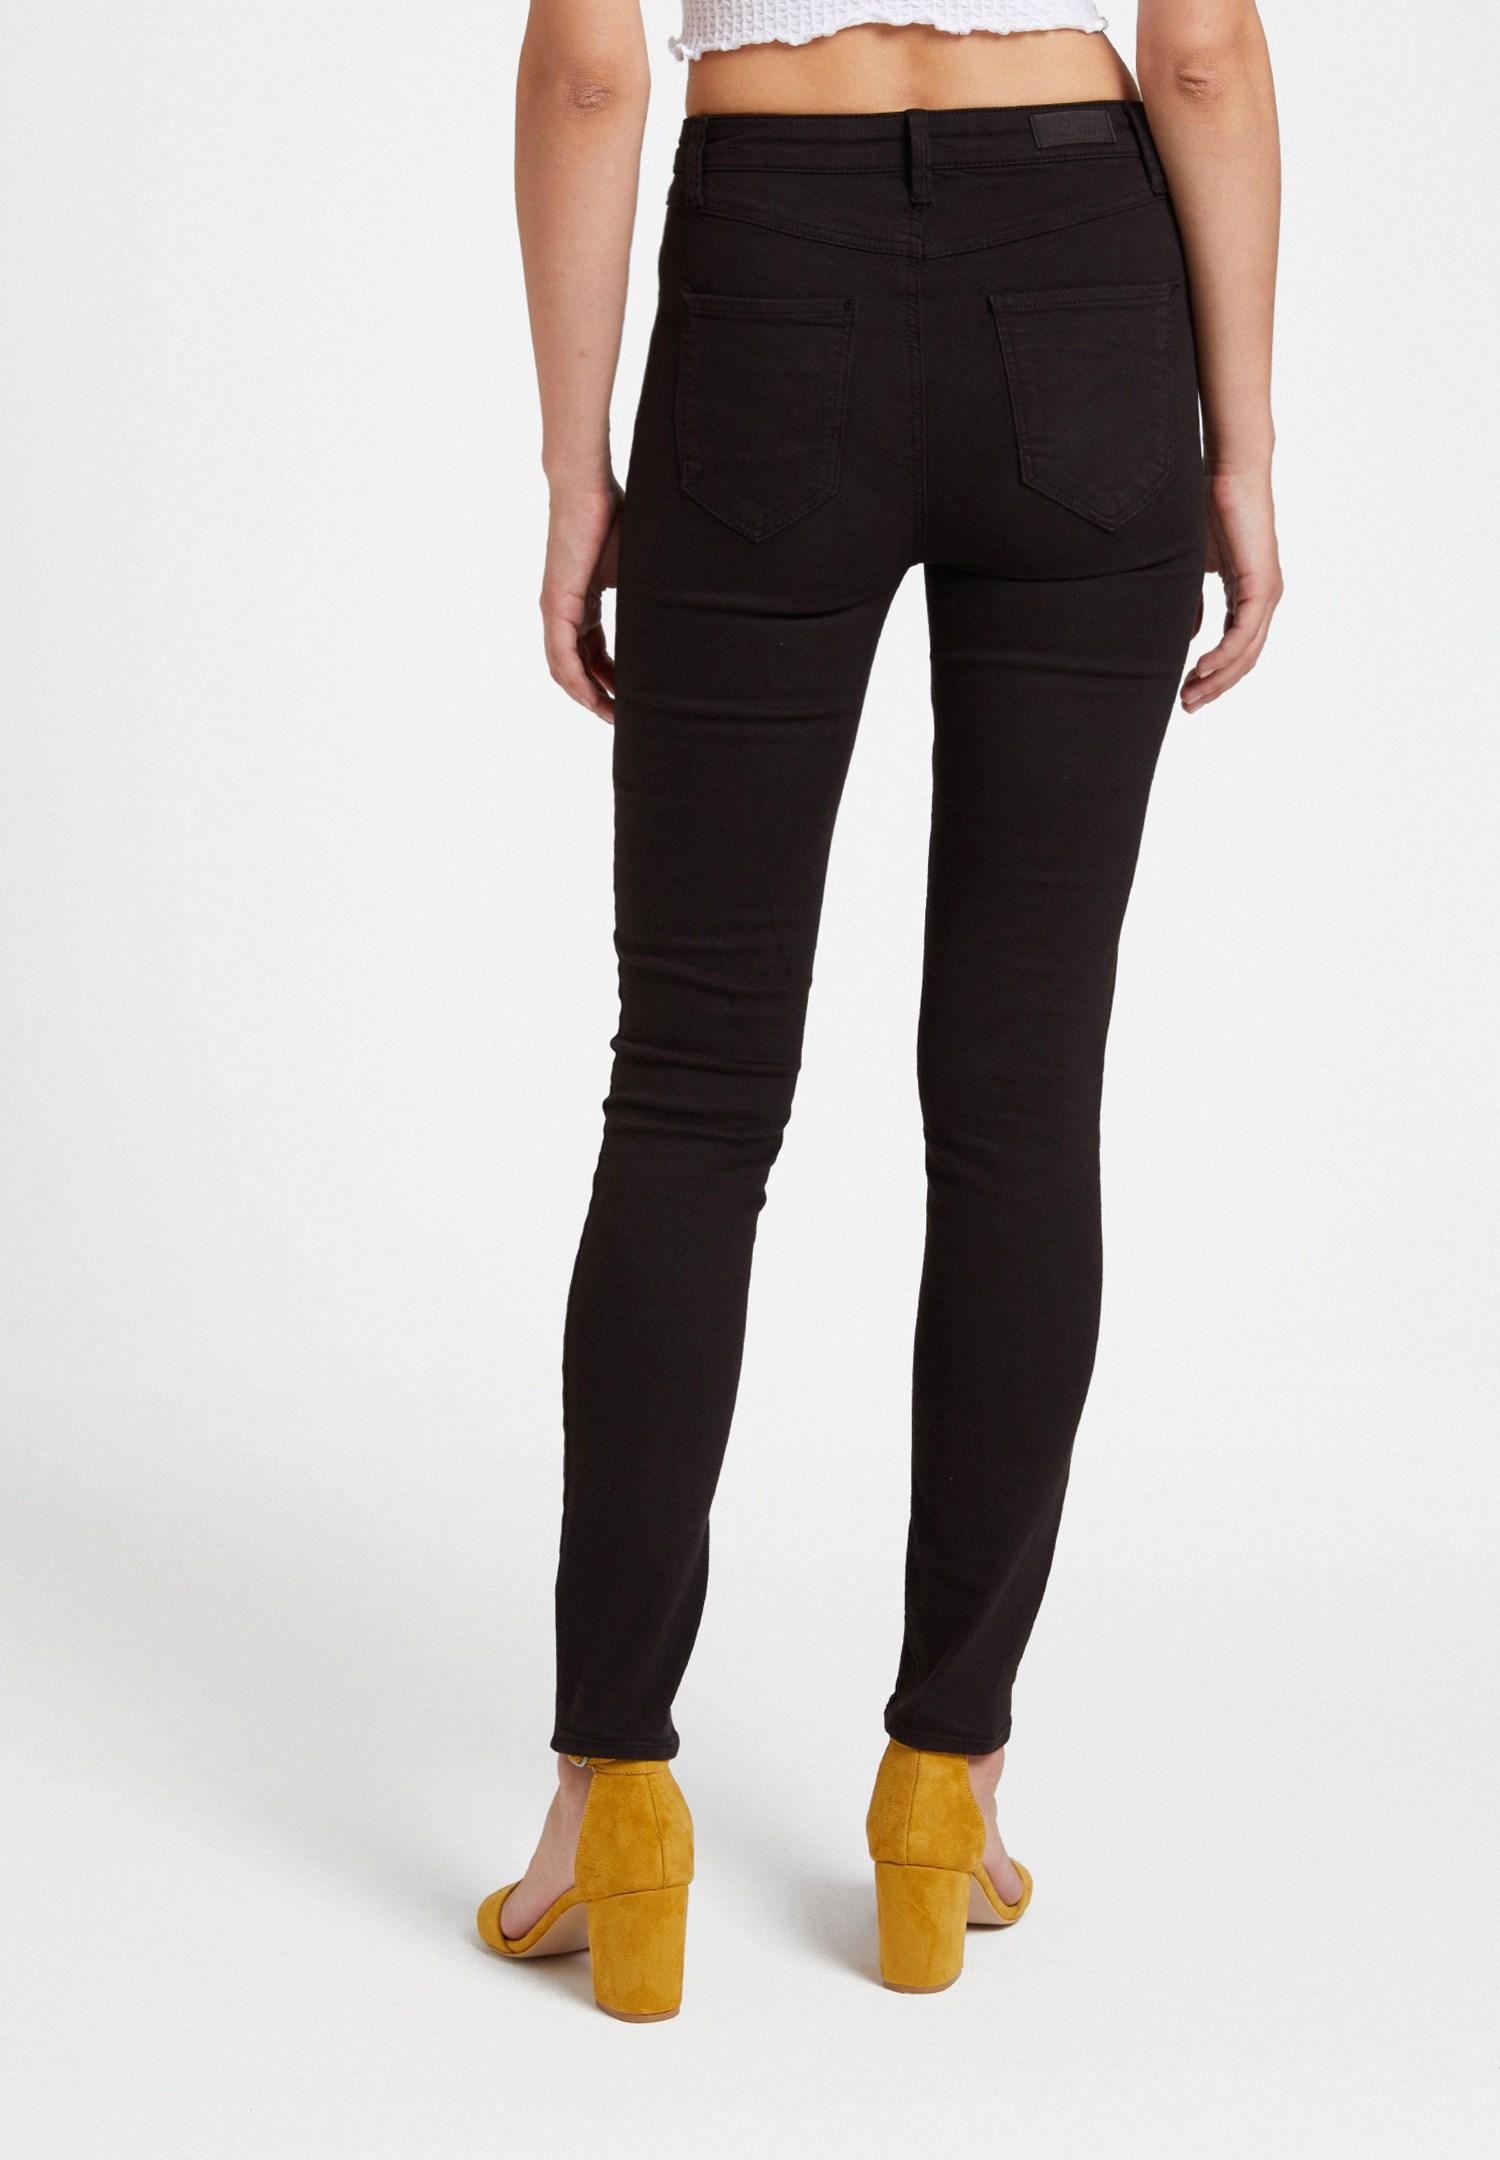 Women Black High Waist Skinny Trousers